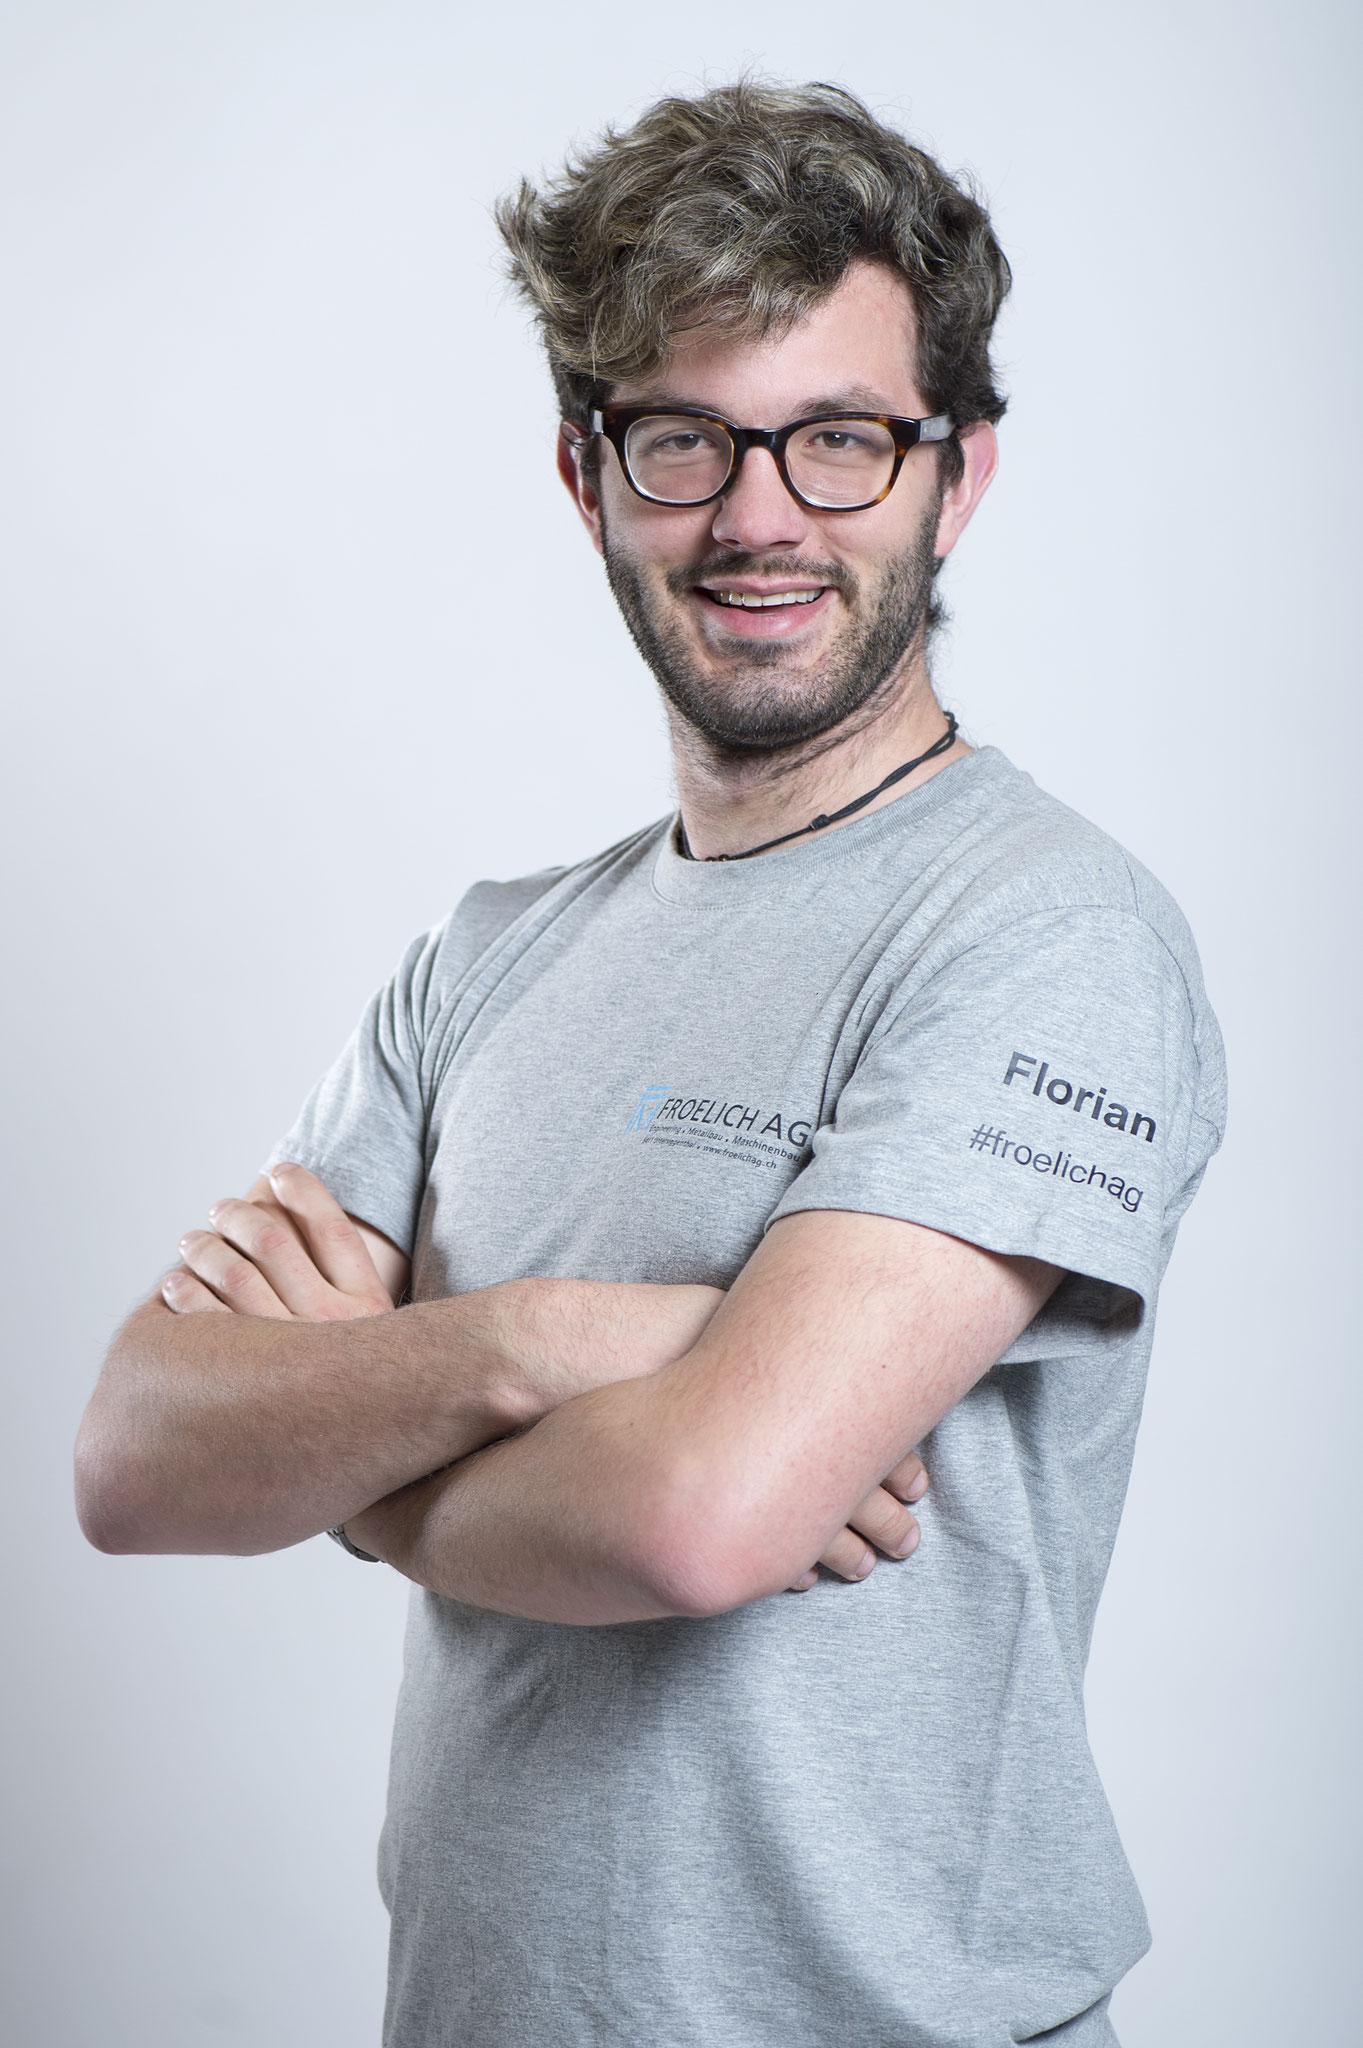 Florian Froelich